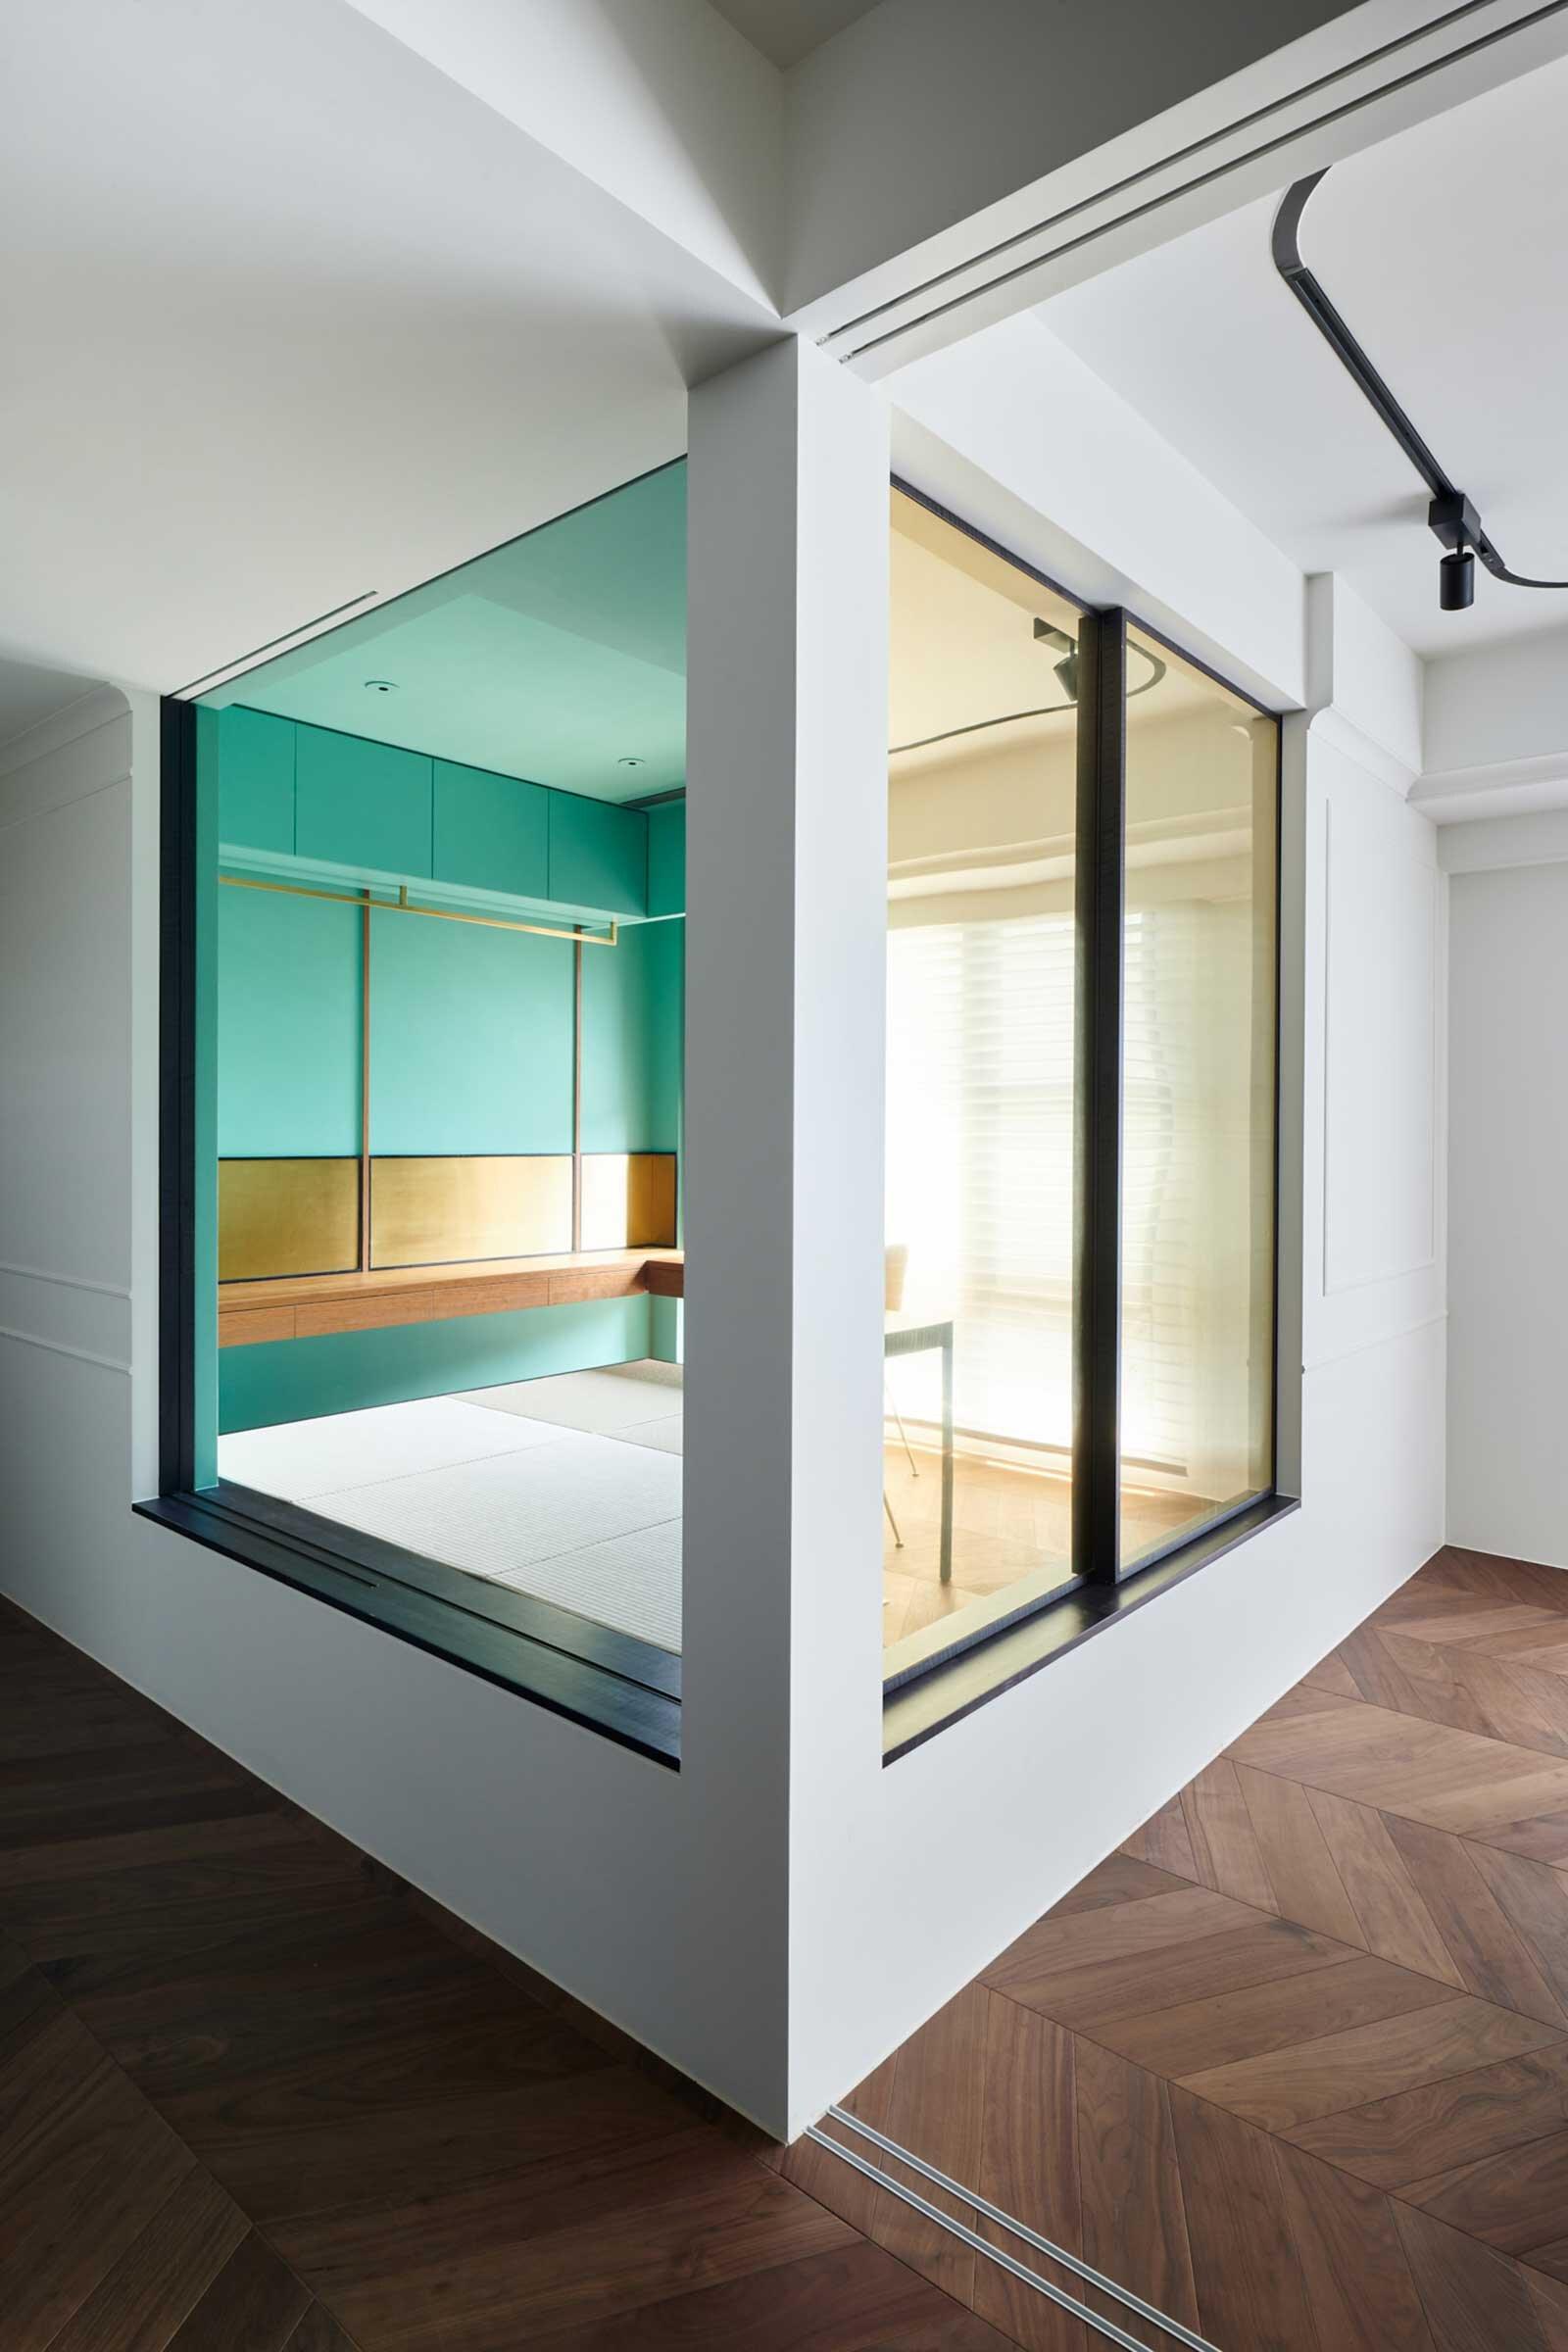 Chen-Studio-Yi-Hsiang-Chao-Architects_DSC6999@0,25x.jpg